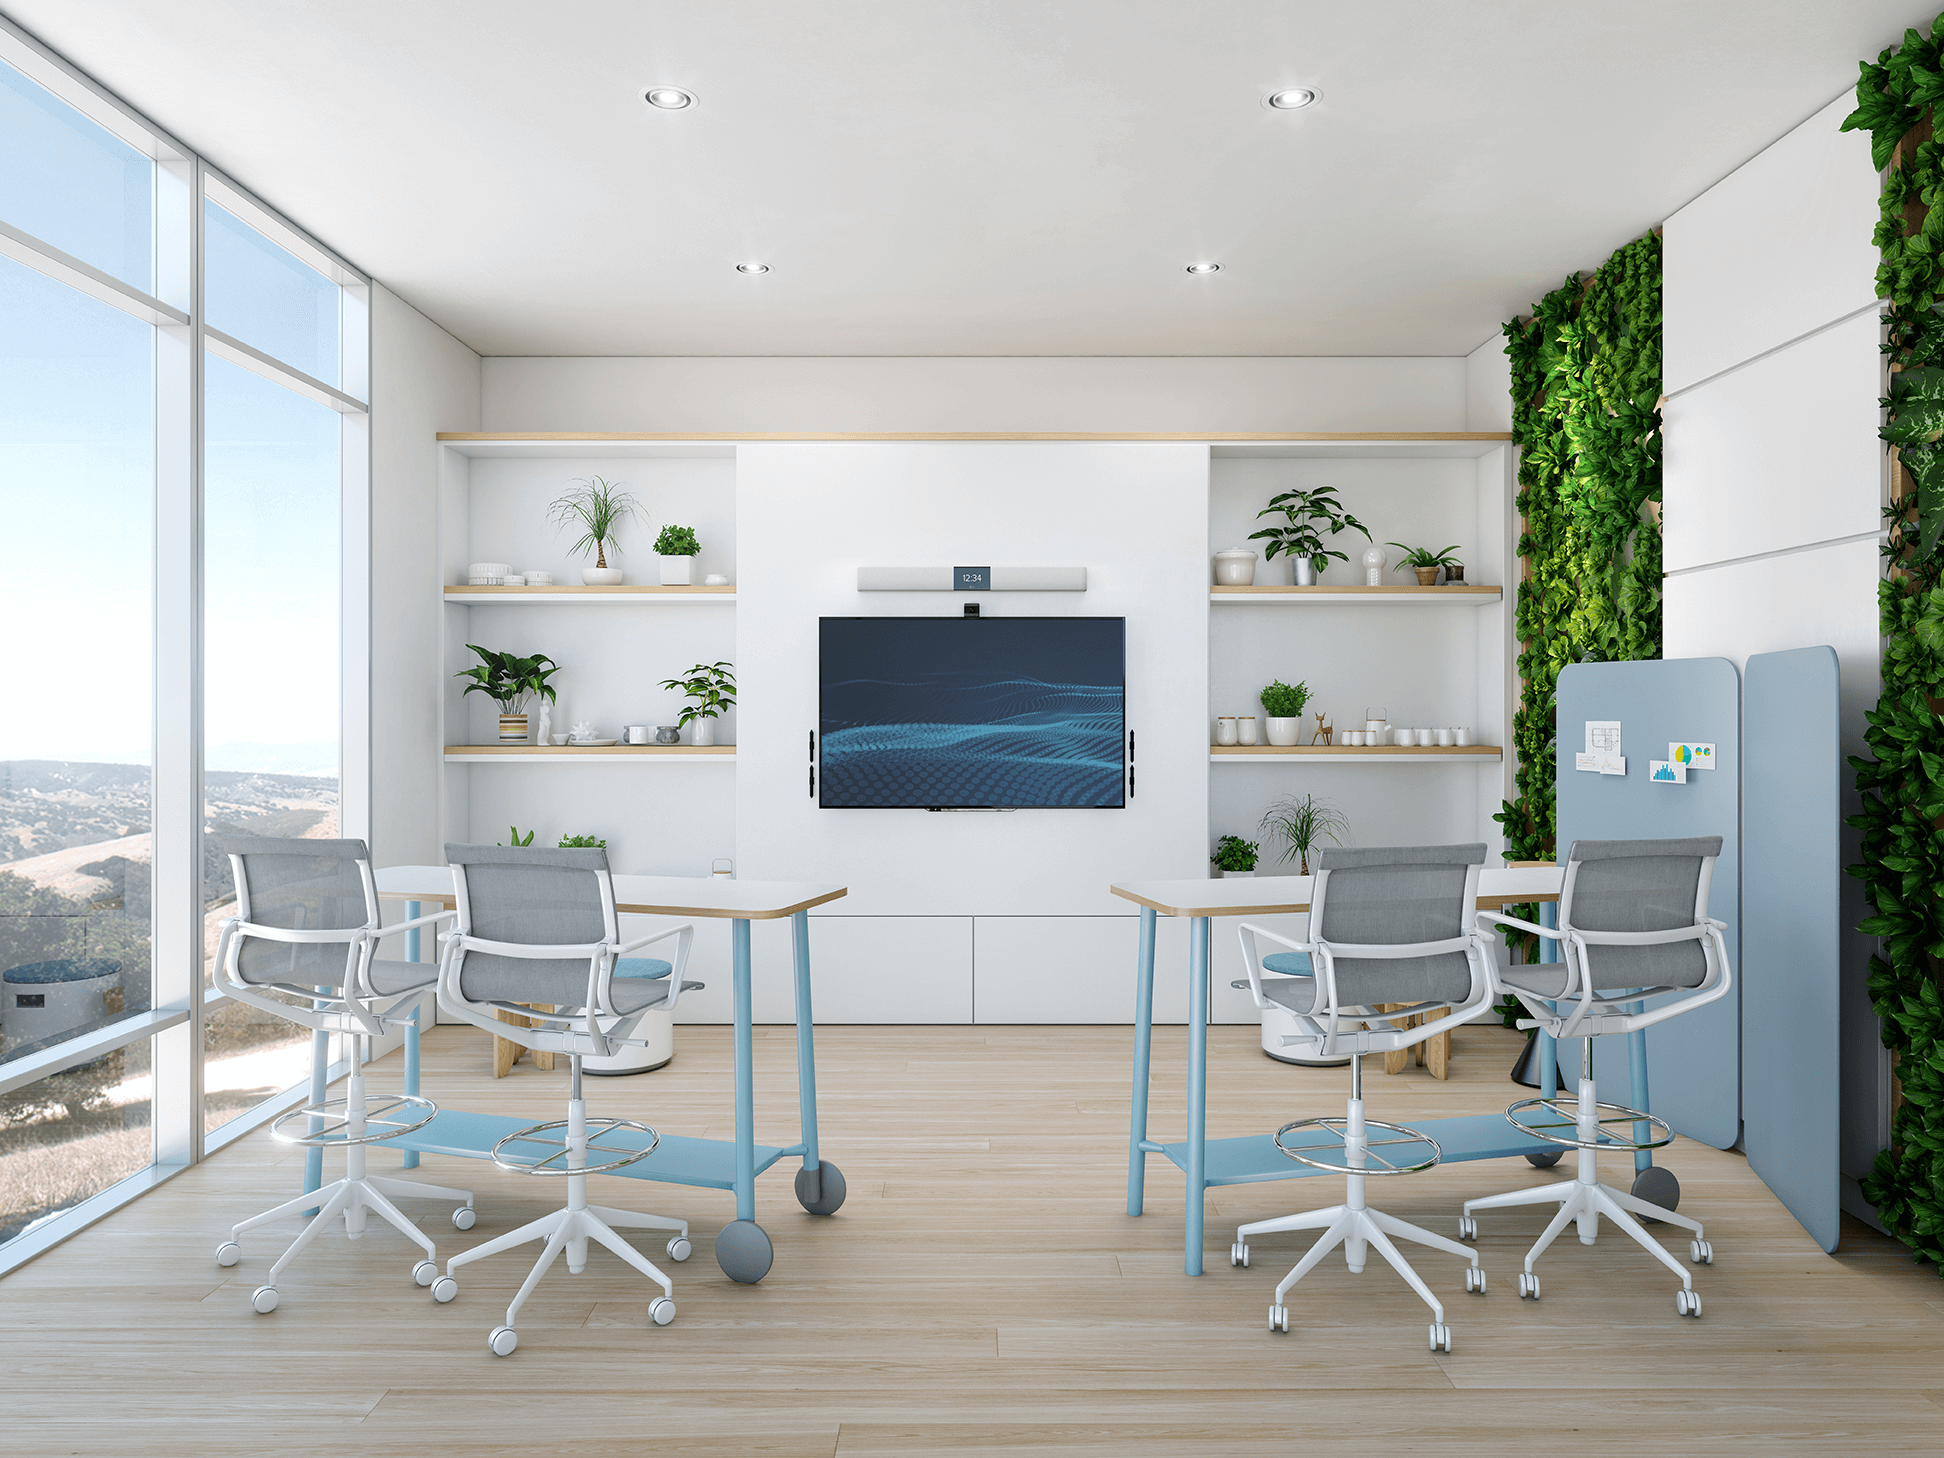 White Space Small Inside V1 2019_12_19 72 dpi